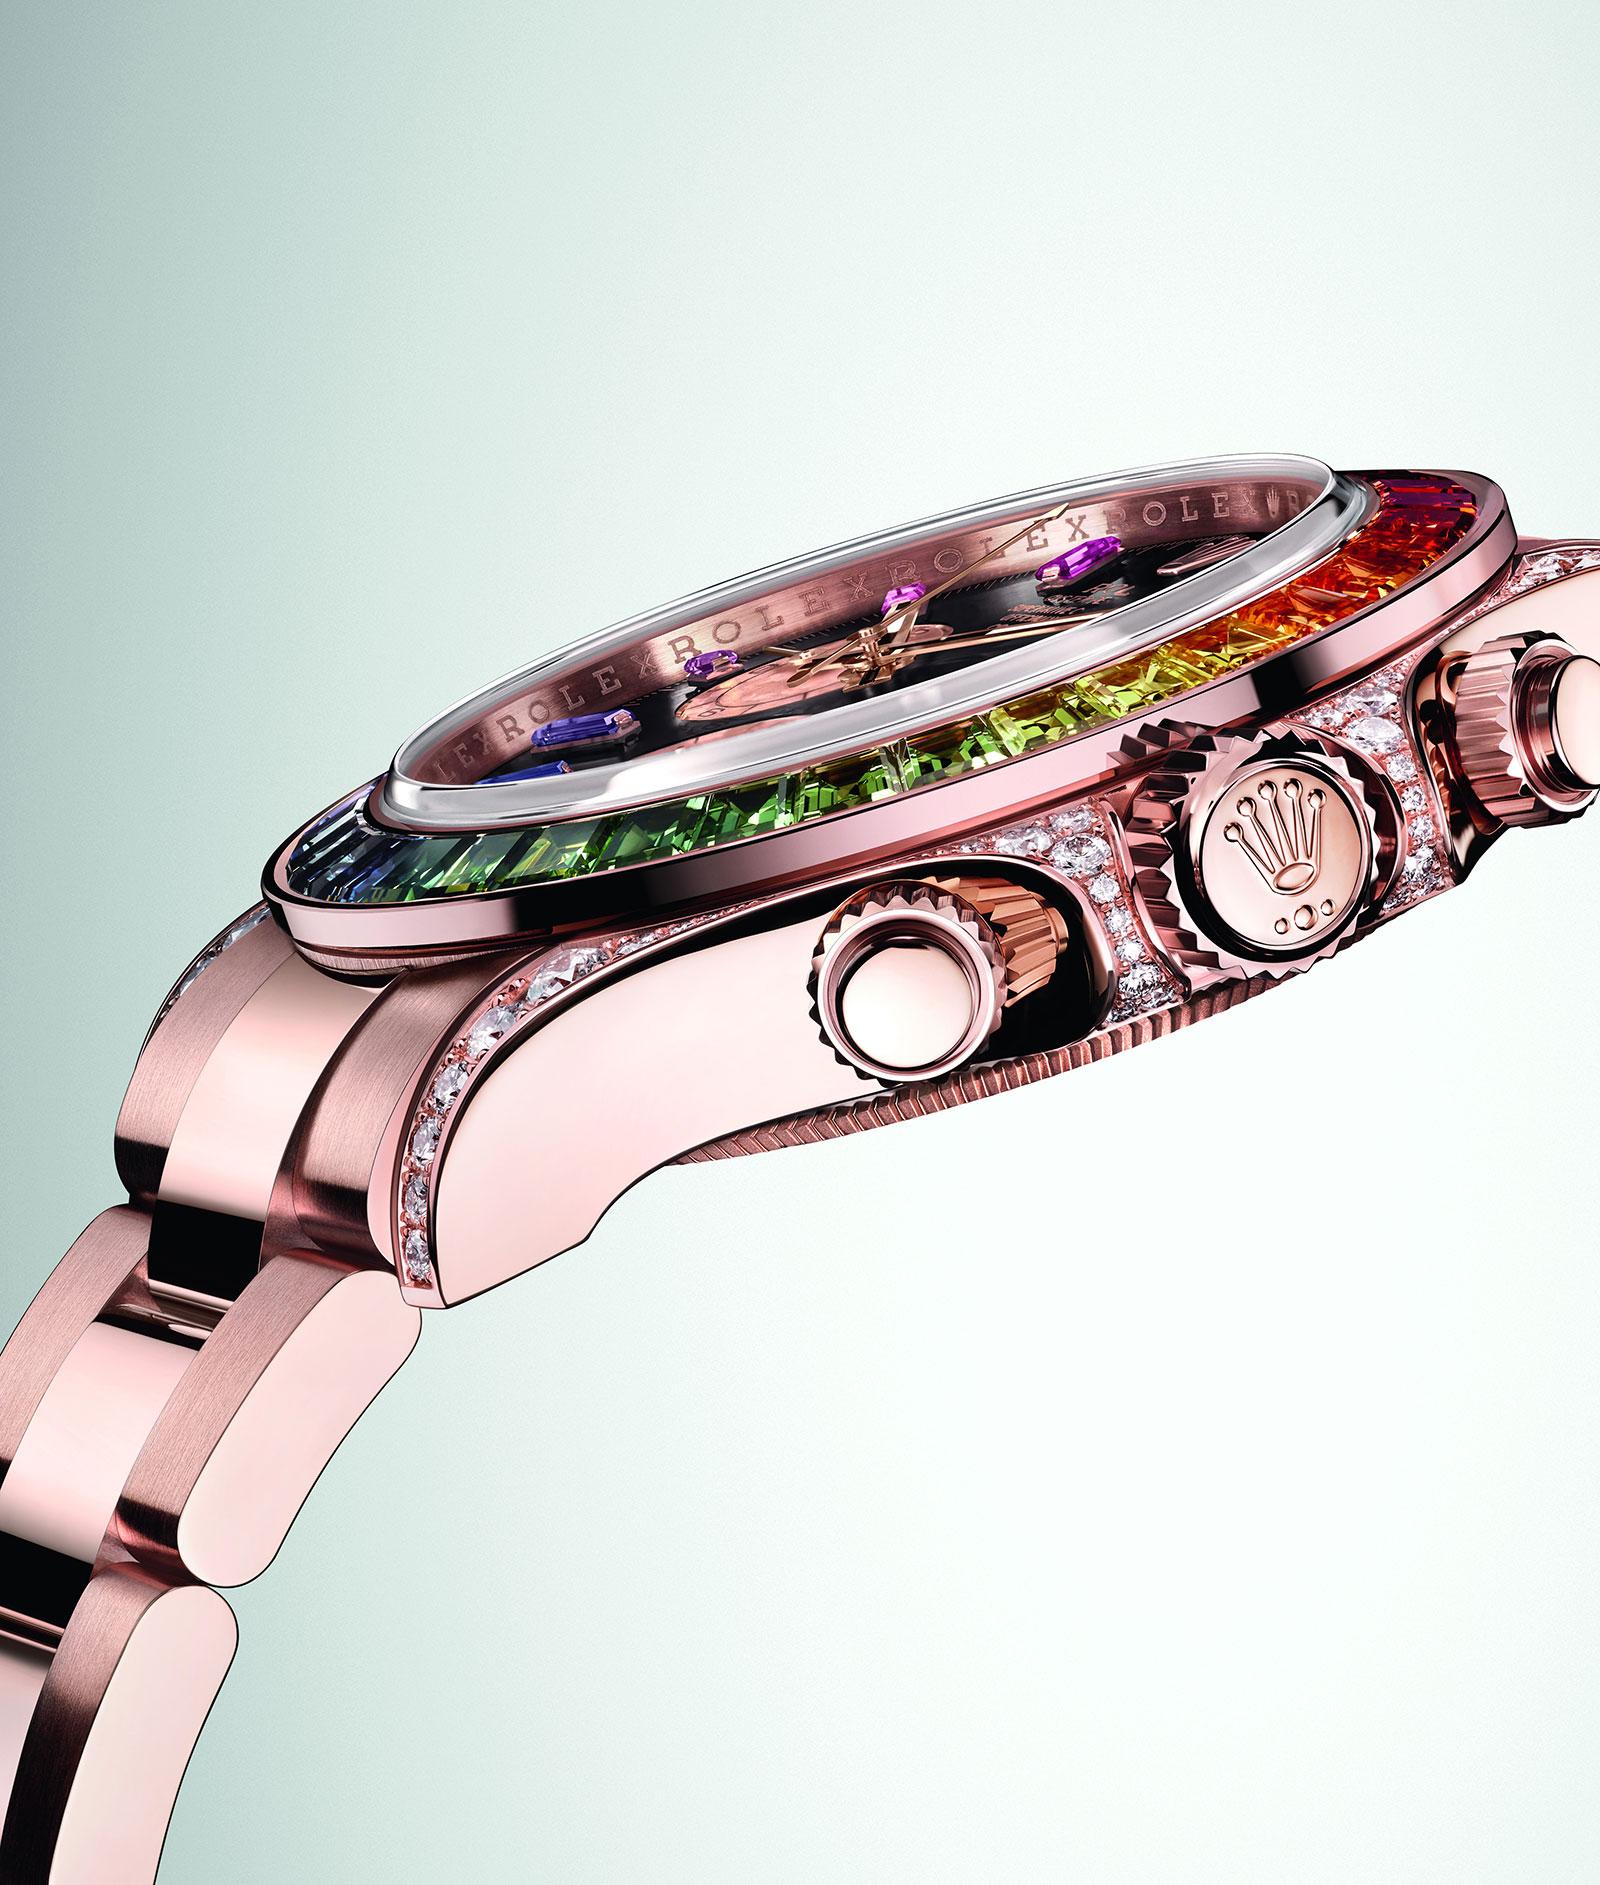 Rolex Daytona Rainbow Everose 116595 RBOW 2